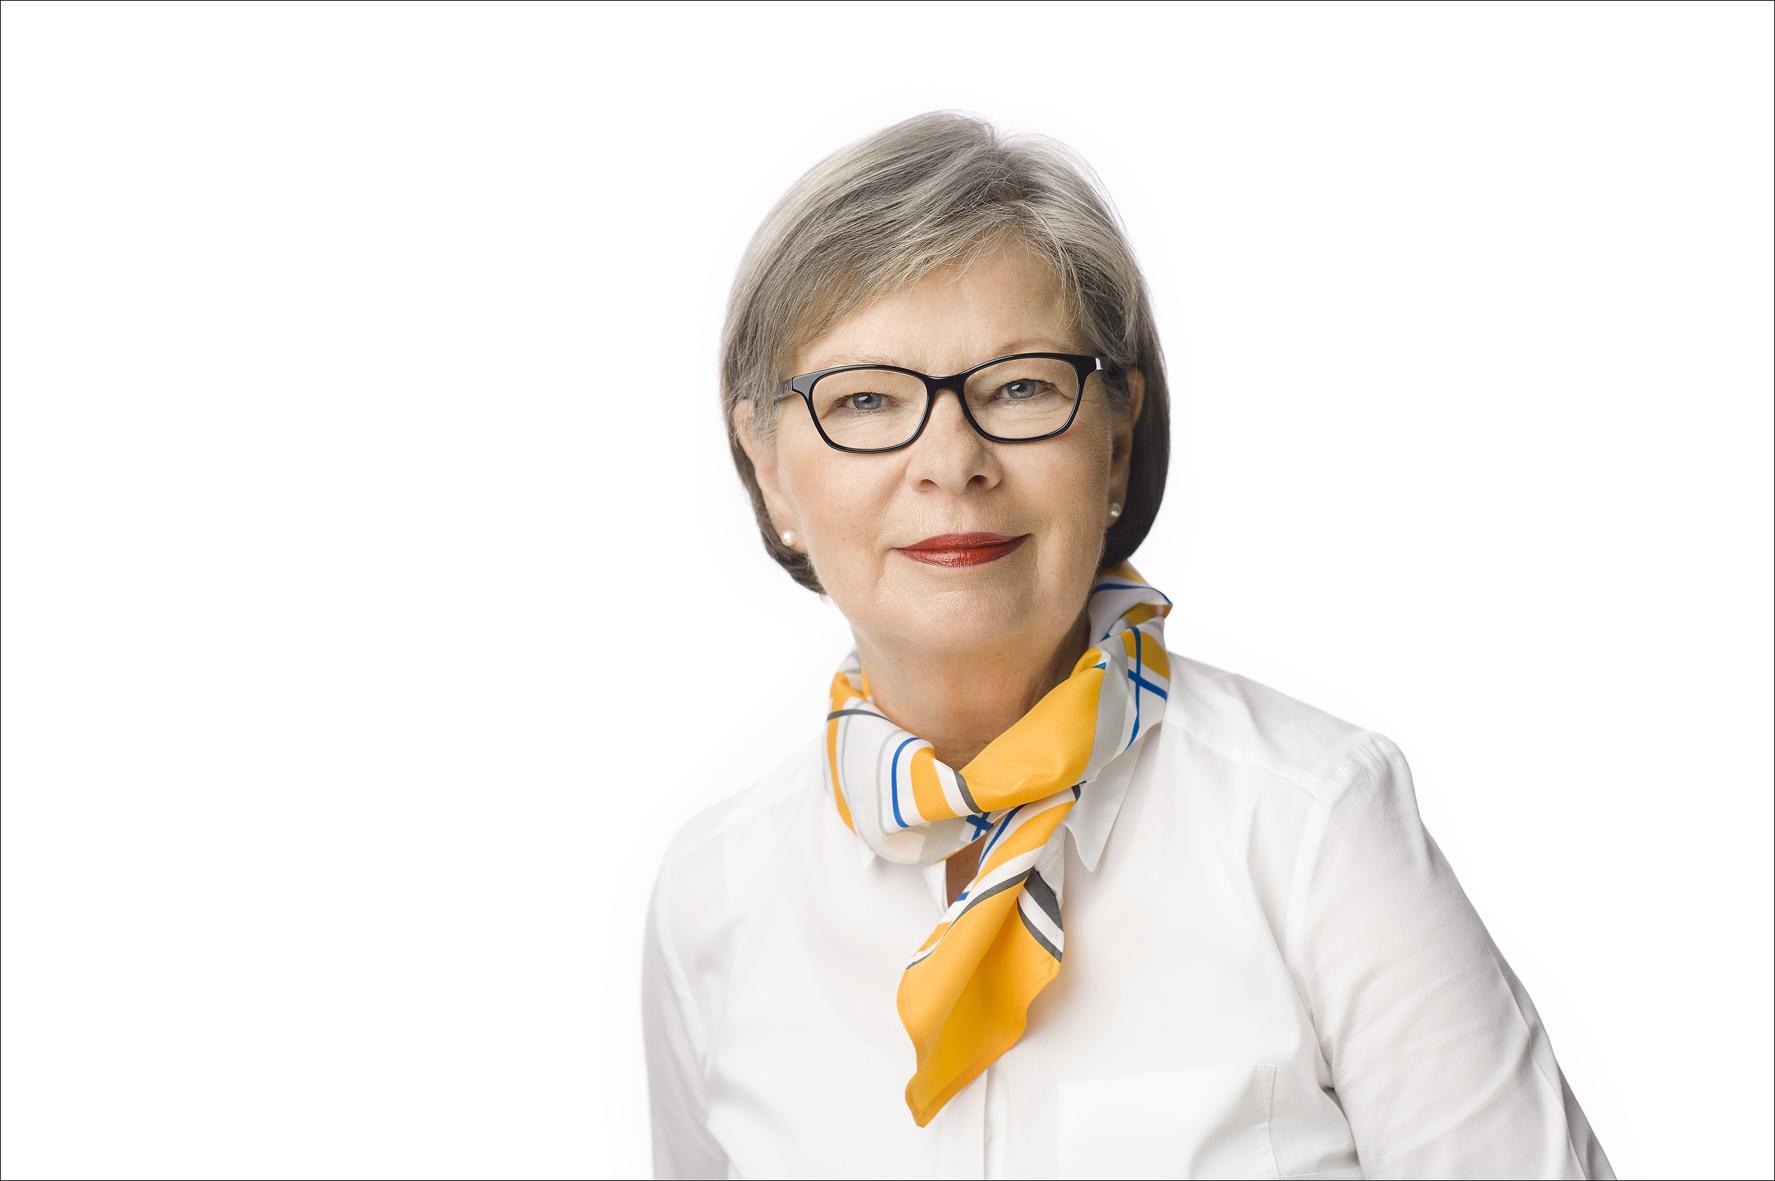 Birgit Riesterer